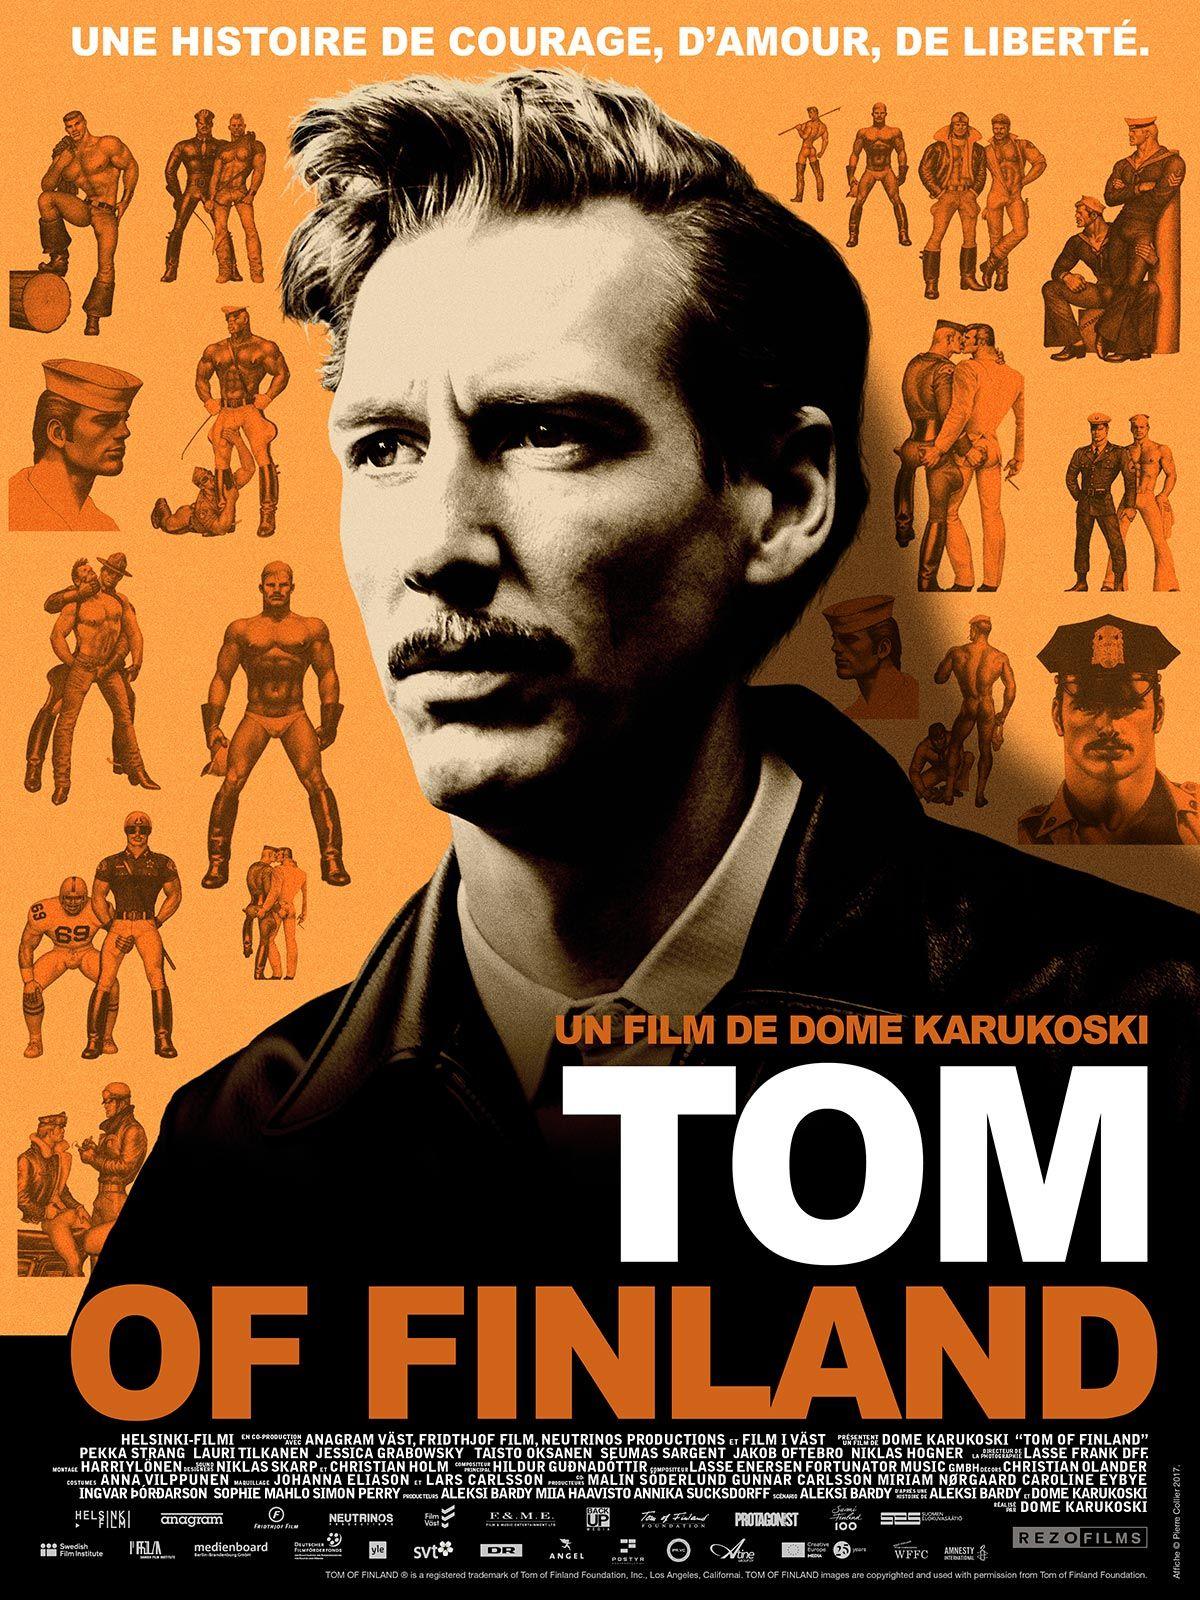 Tom of Finland Movie 21, Movie Film, New Movies, Movies Online, Tom